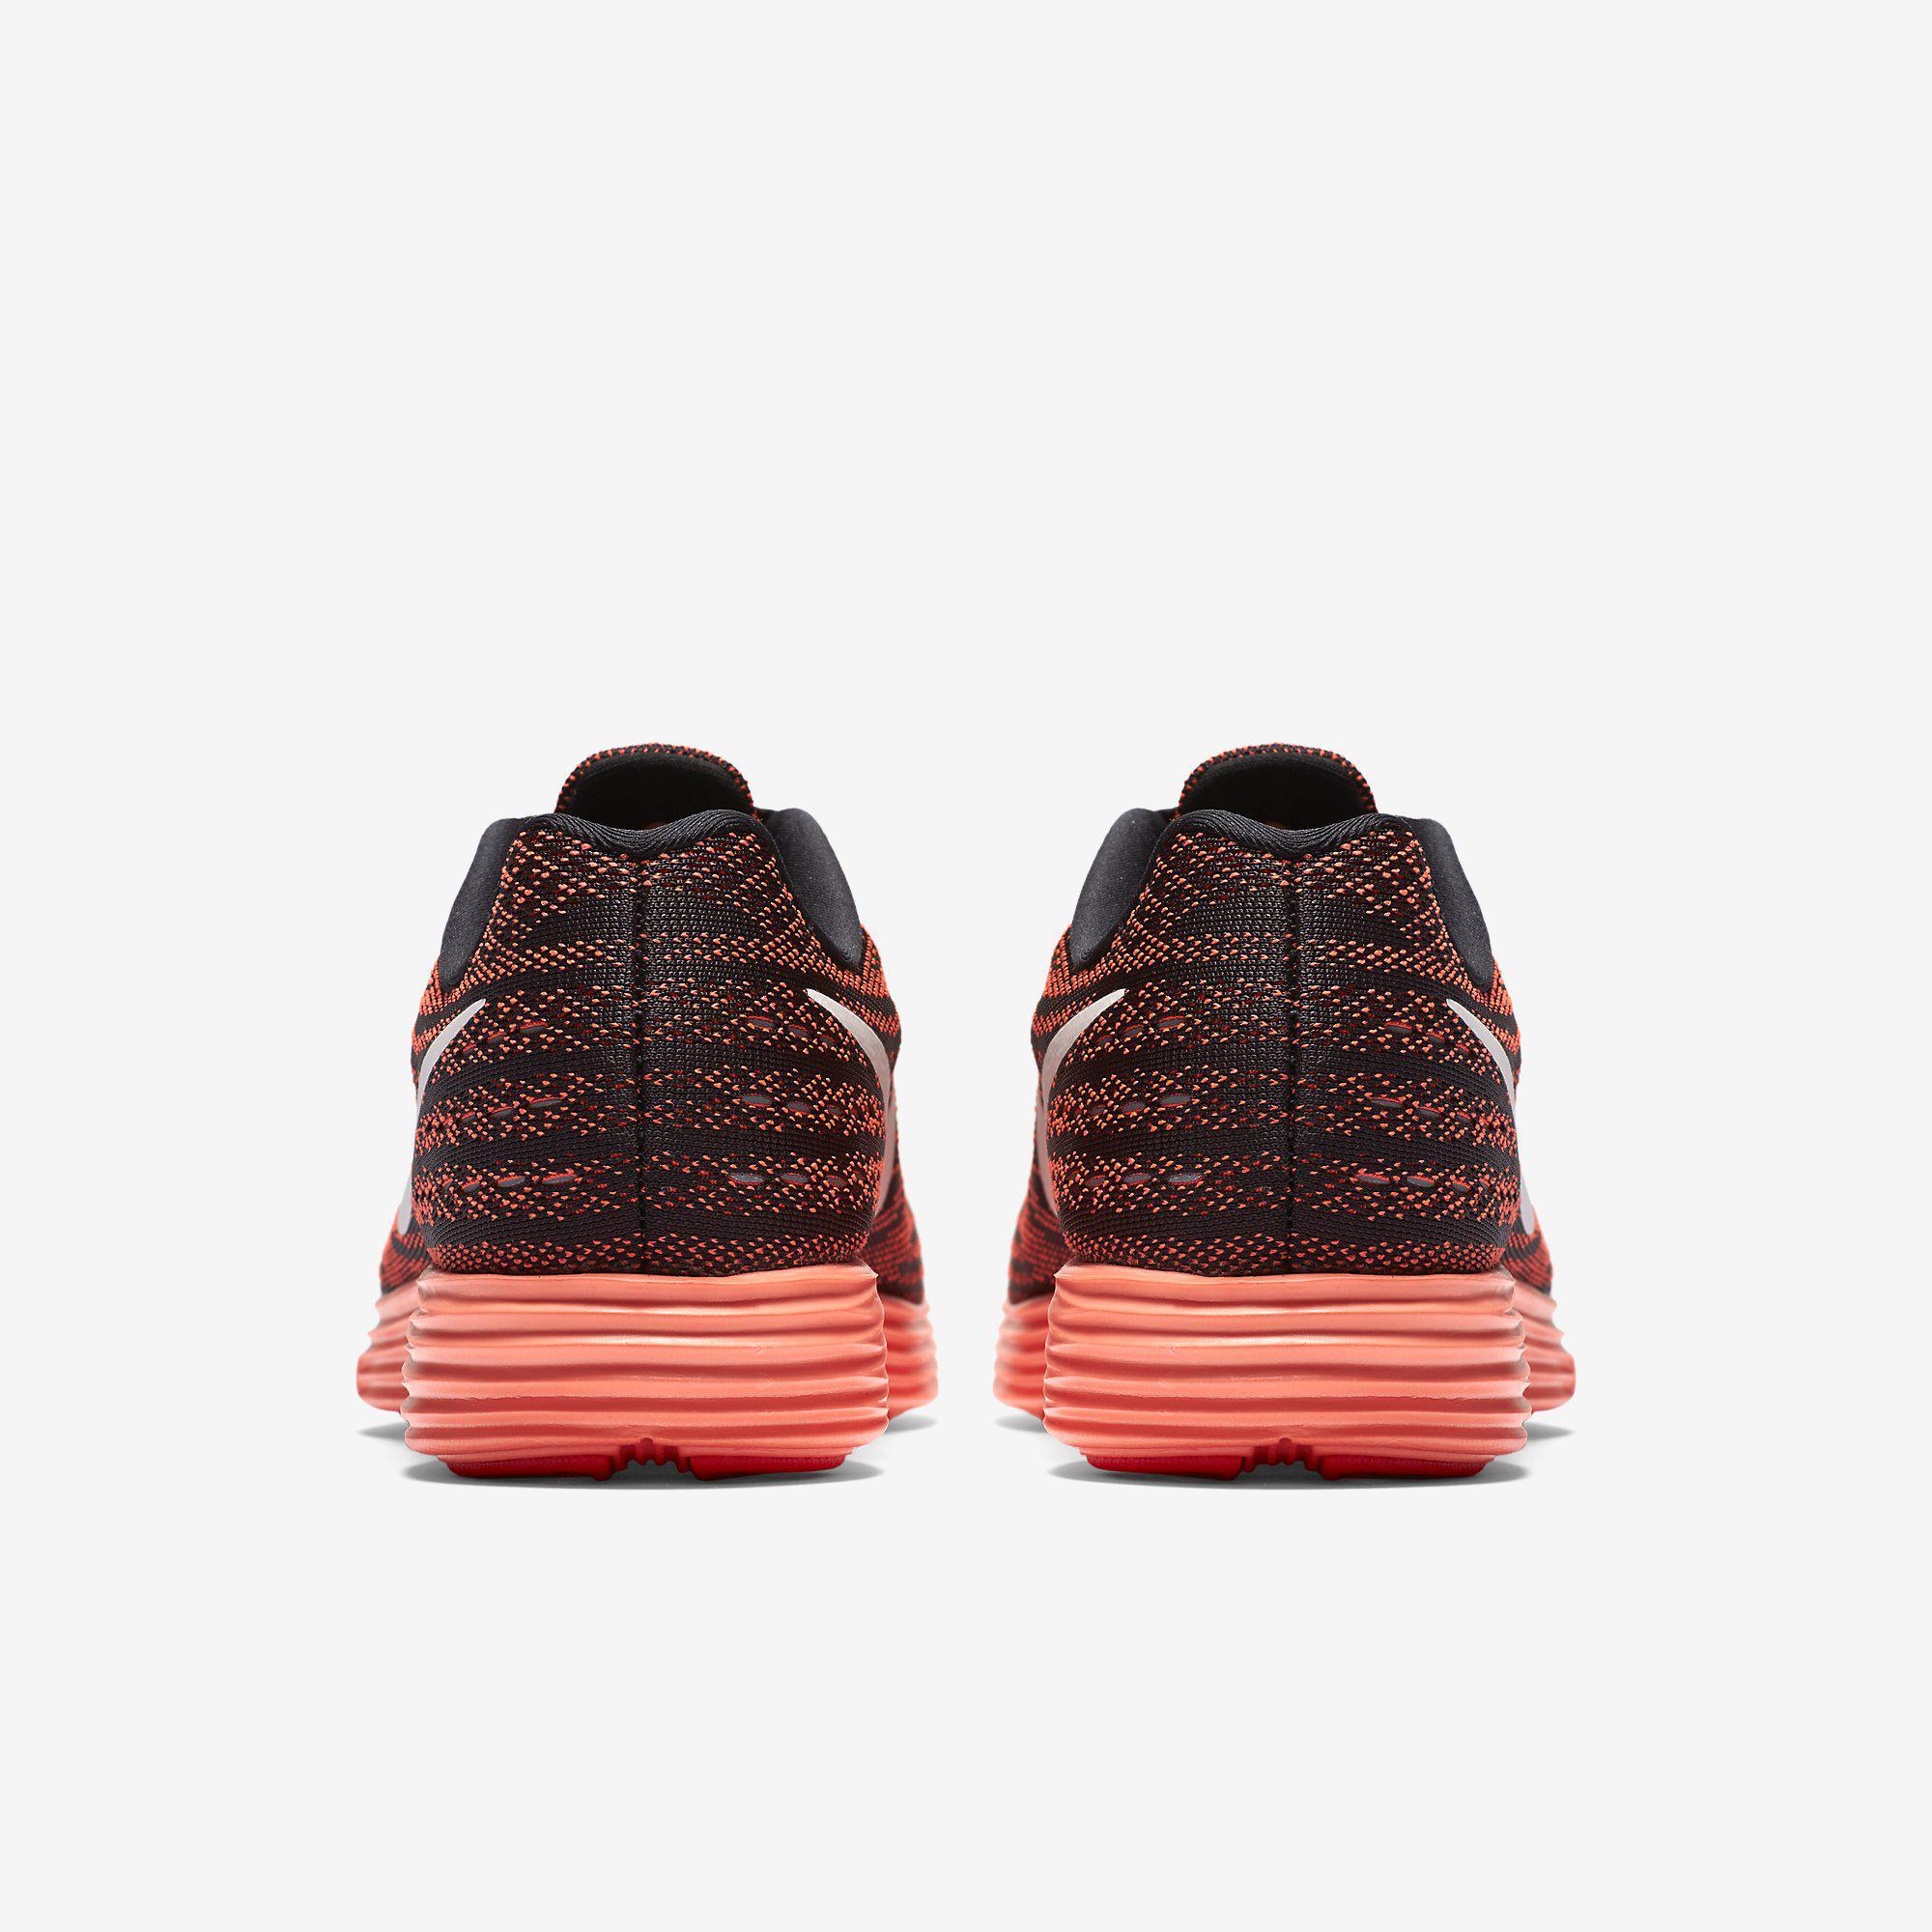 d992c2081c9f Nike Womens LunarTempo 2 Running Shoes - Bright Crimson Black ...